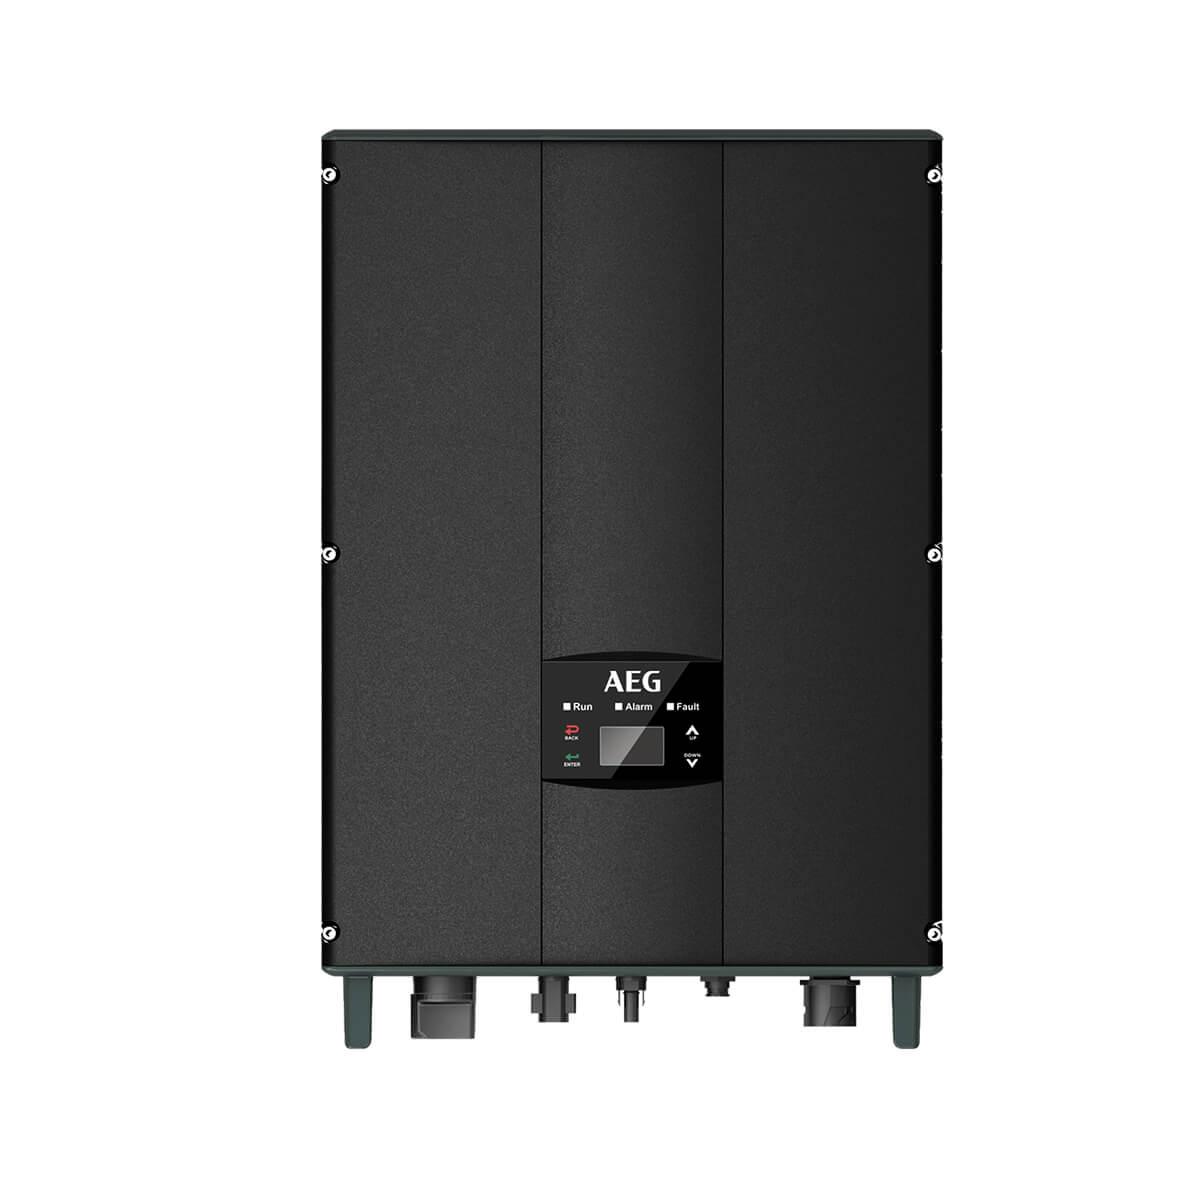 aeg 10kW inverter, aeg as-ic01 10kW inverter, aeg as-ic01-10000-2 inverter, aeg as-ic01-10000-2, aeg as-ic01 10kW, AEG 10 KW